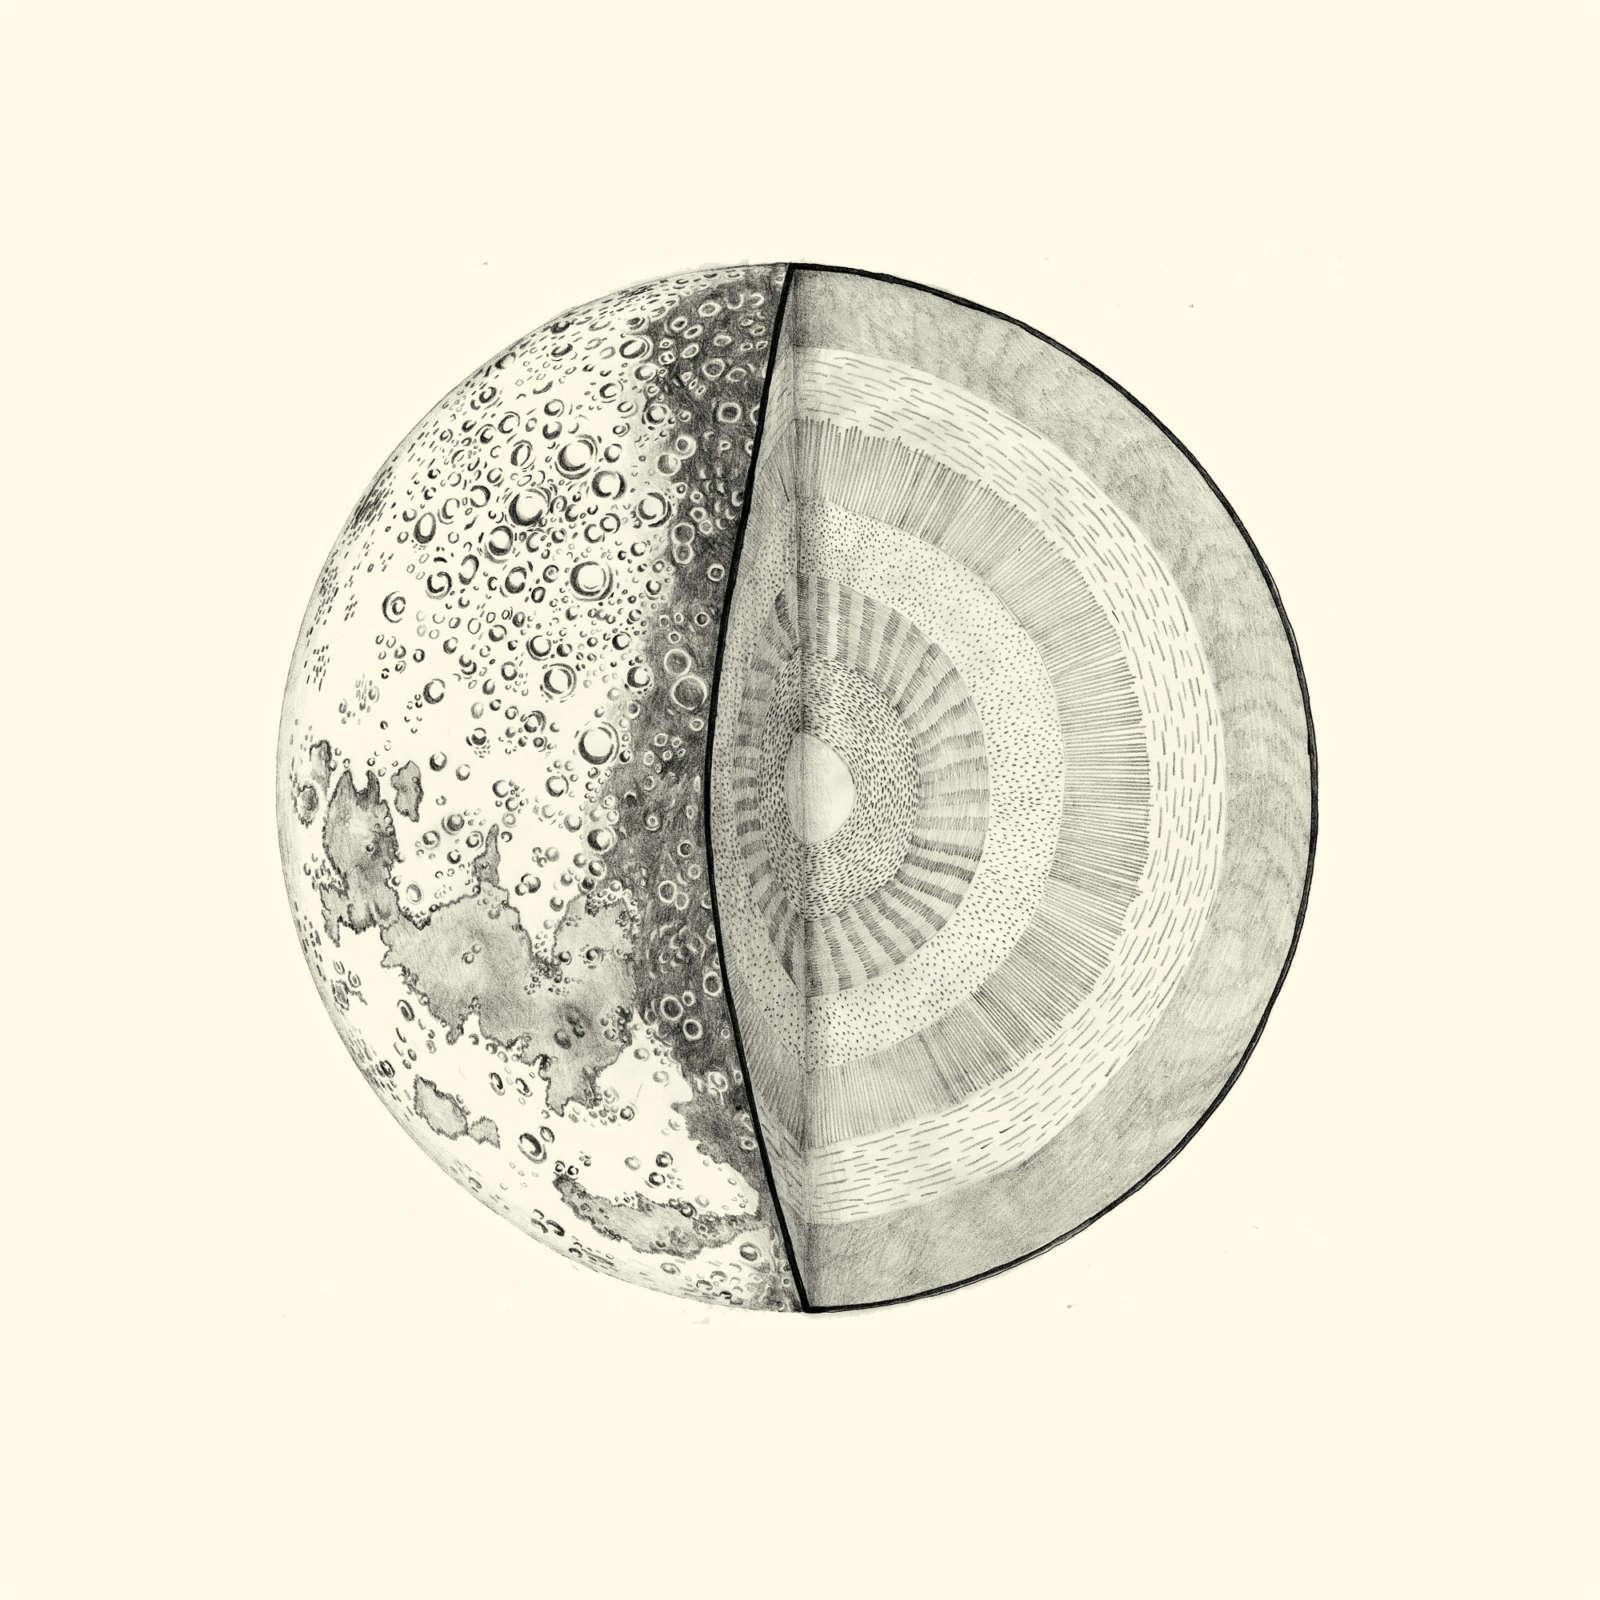 Essy  May  Personal  Earth Moon Sun Pencil Web